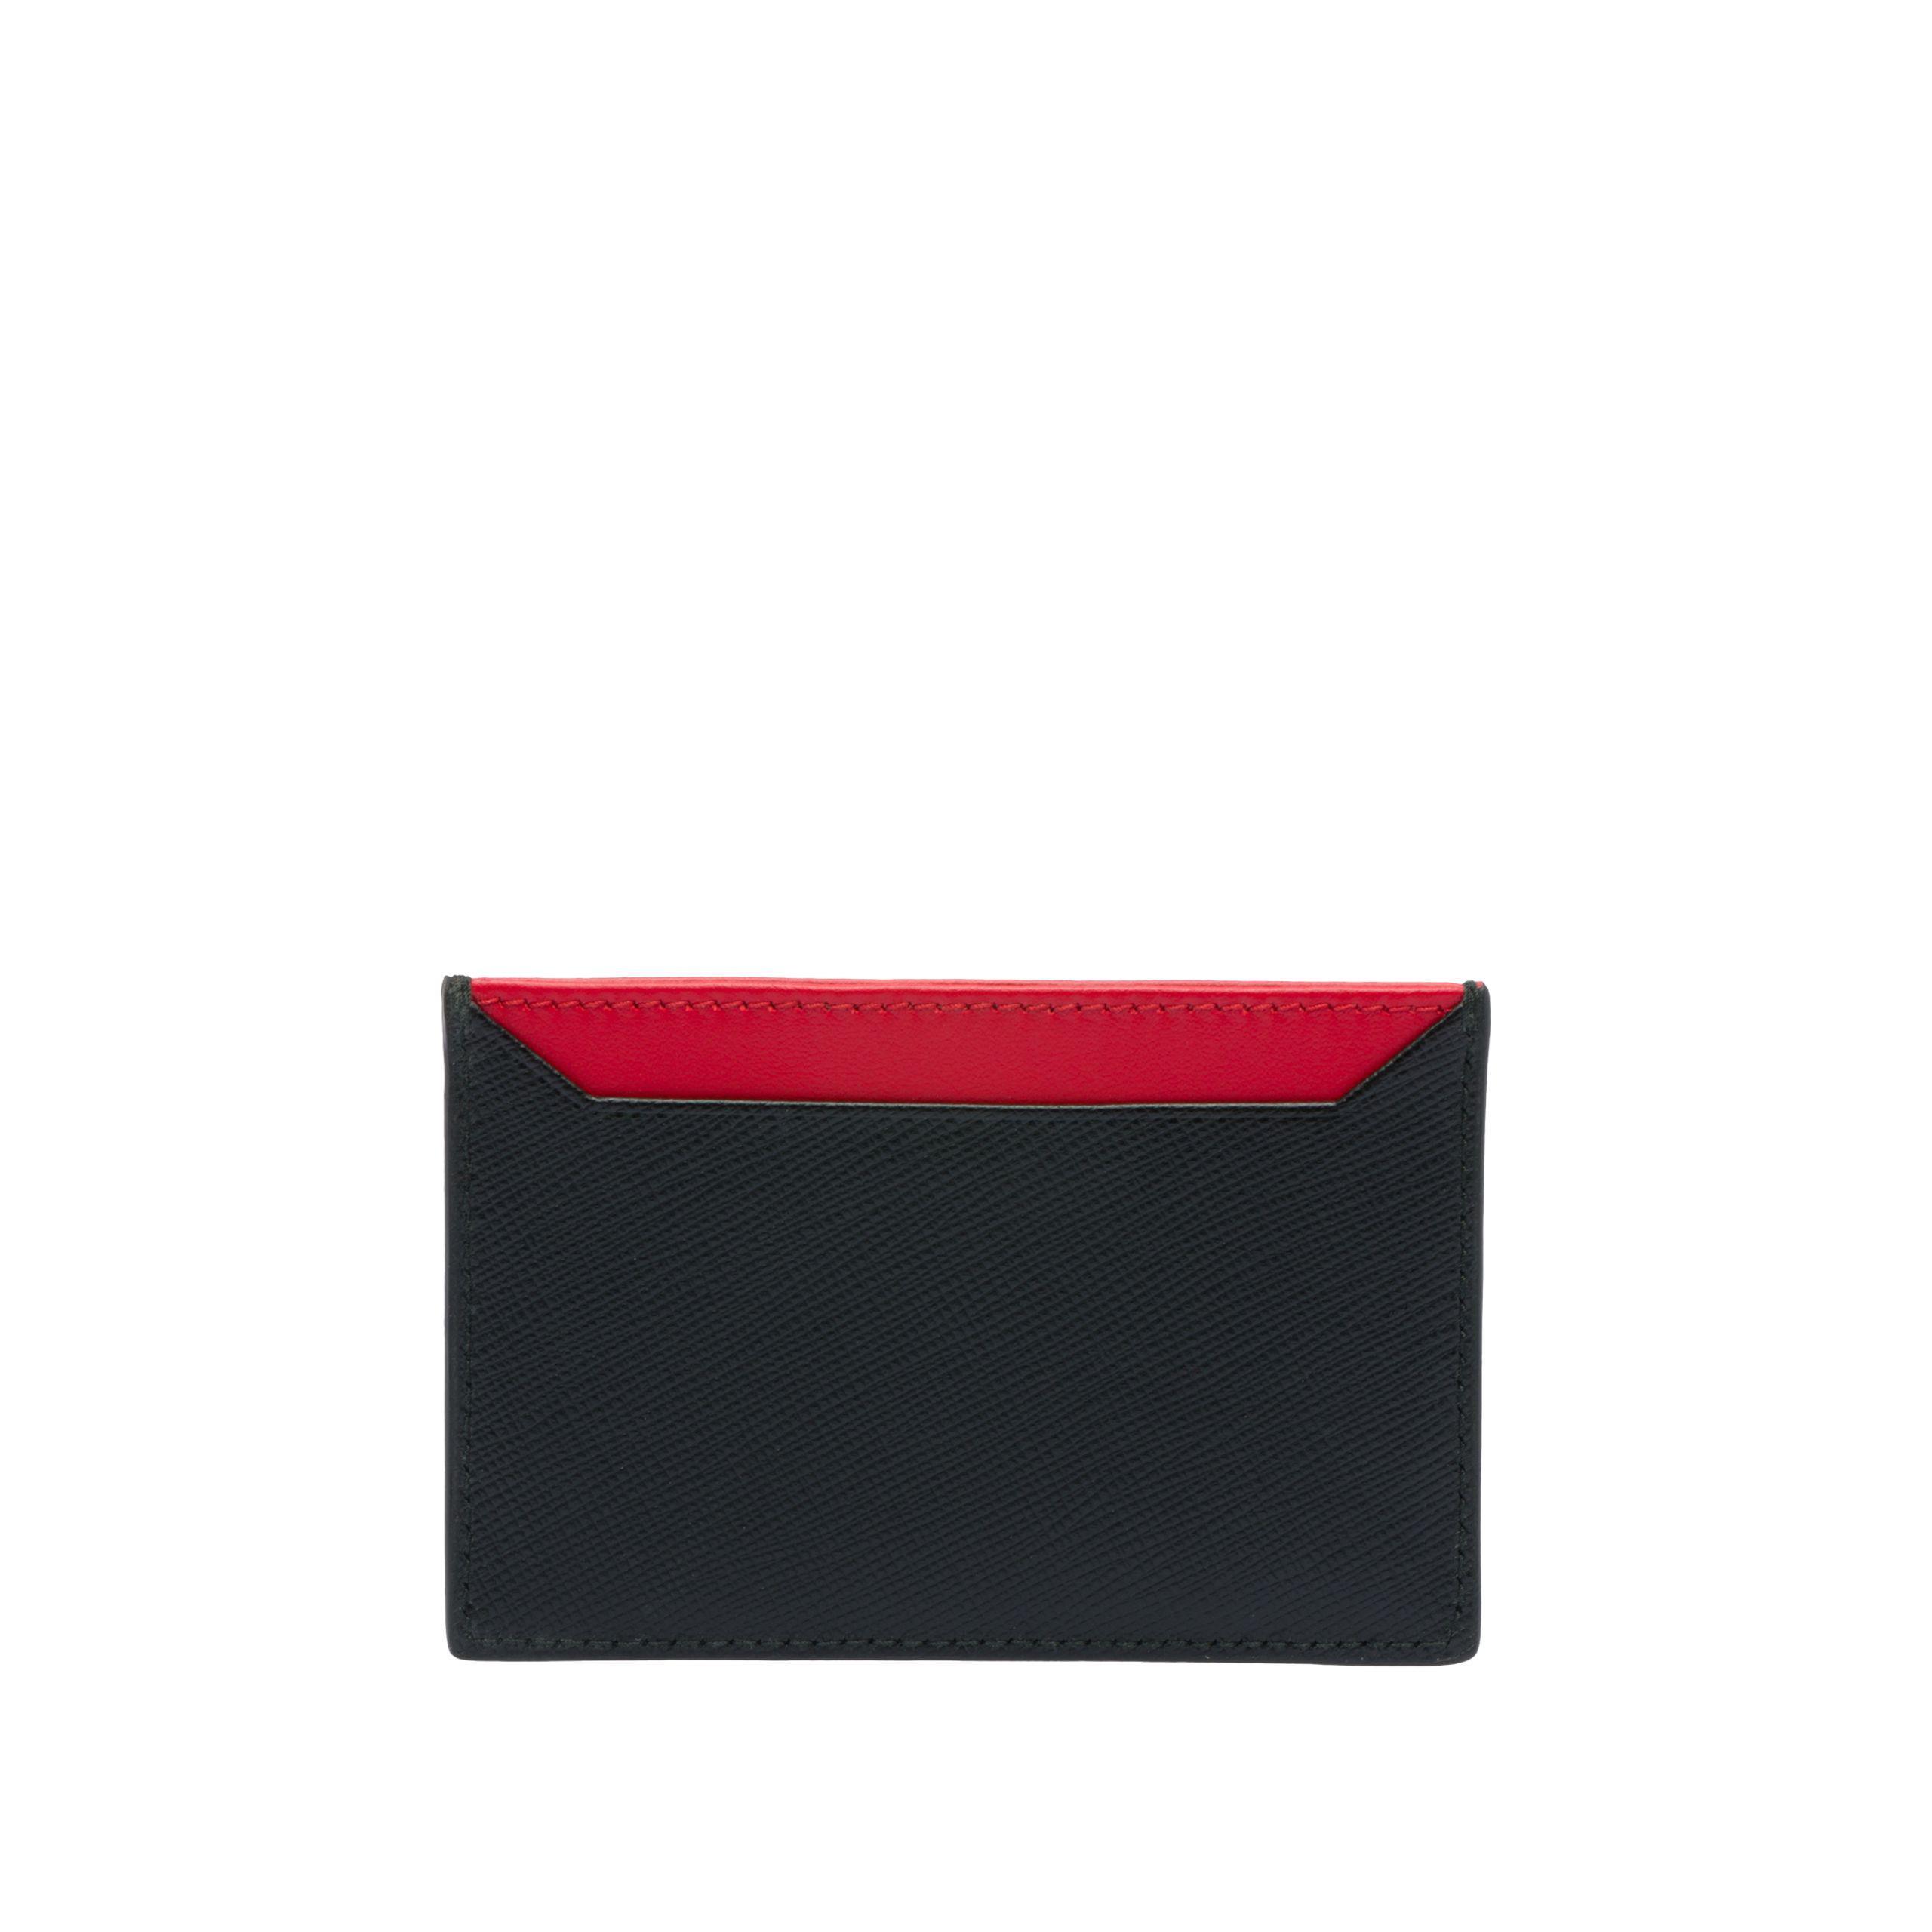 68391ded5904 Prada Malia Saffiano Leather Card Holder in Red - Lyst